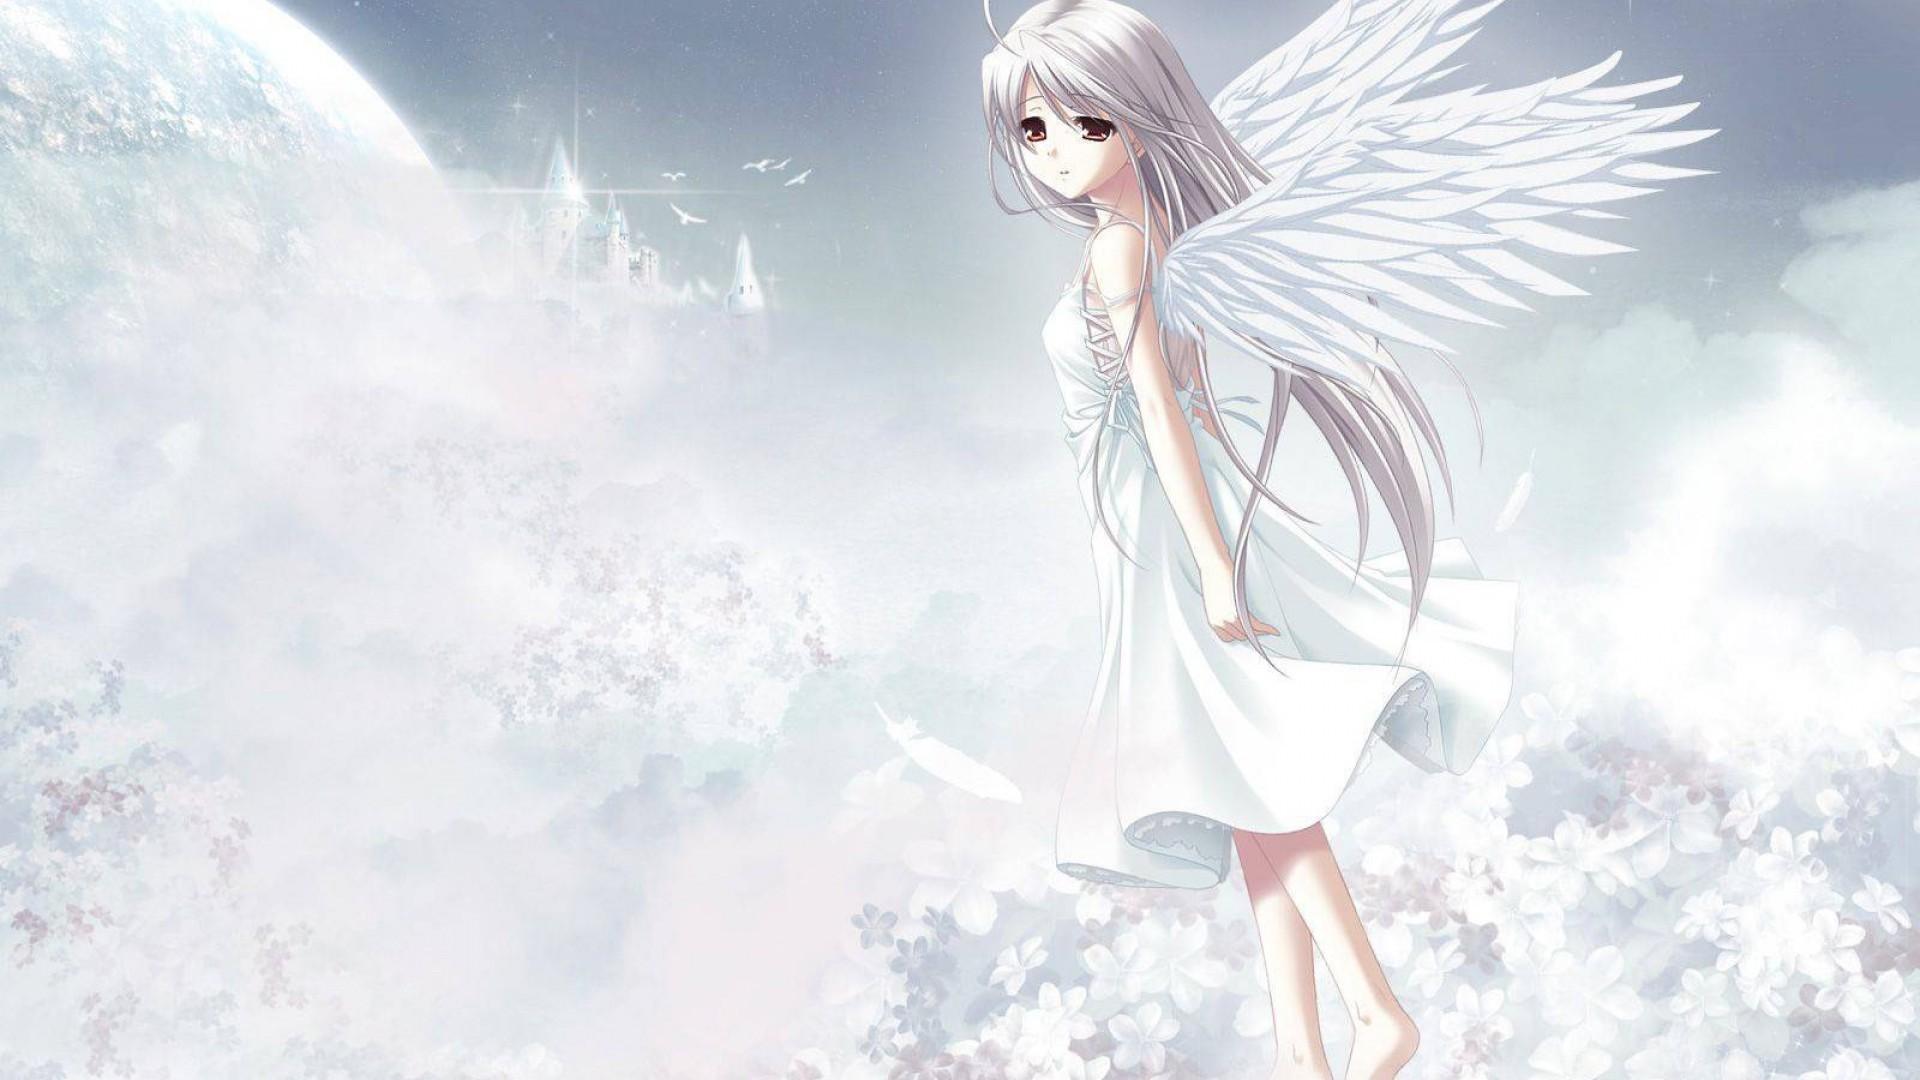 Explore and share Cute Anime Girl Wallpaper on WallpaperSafari